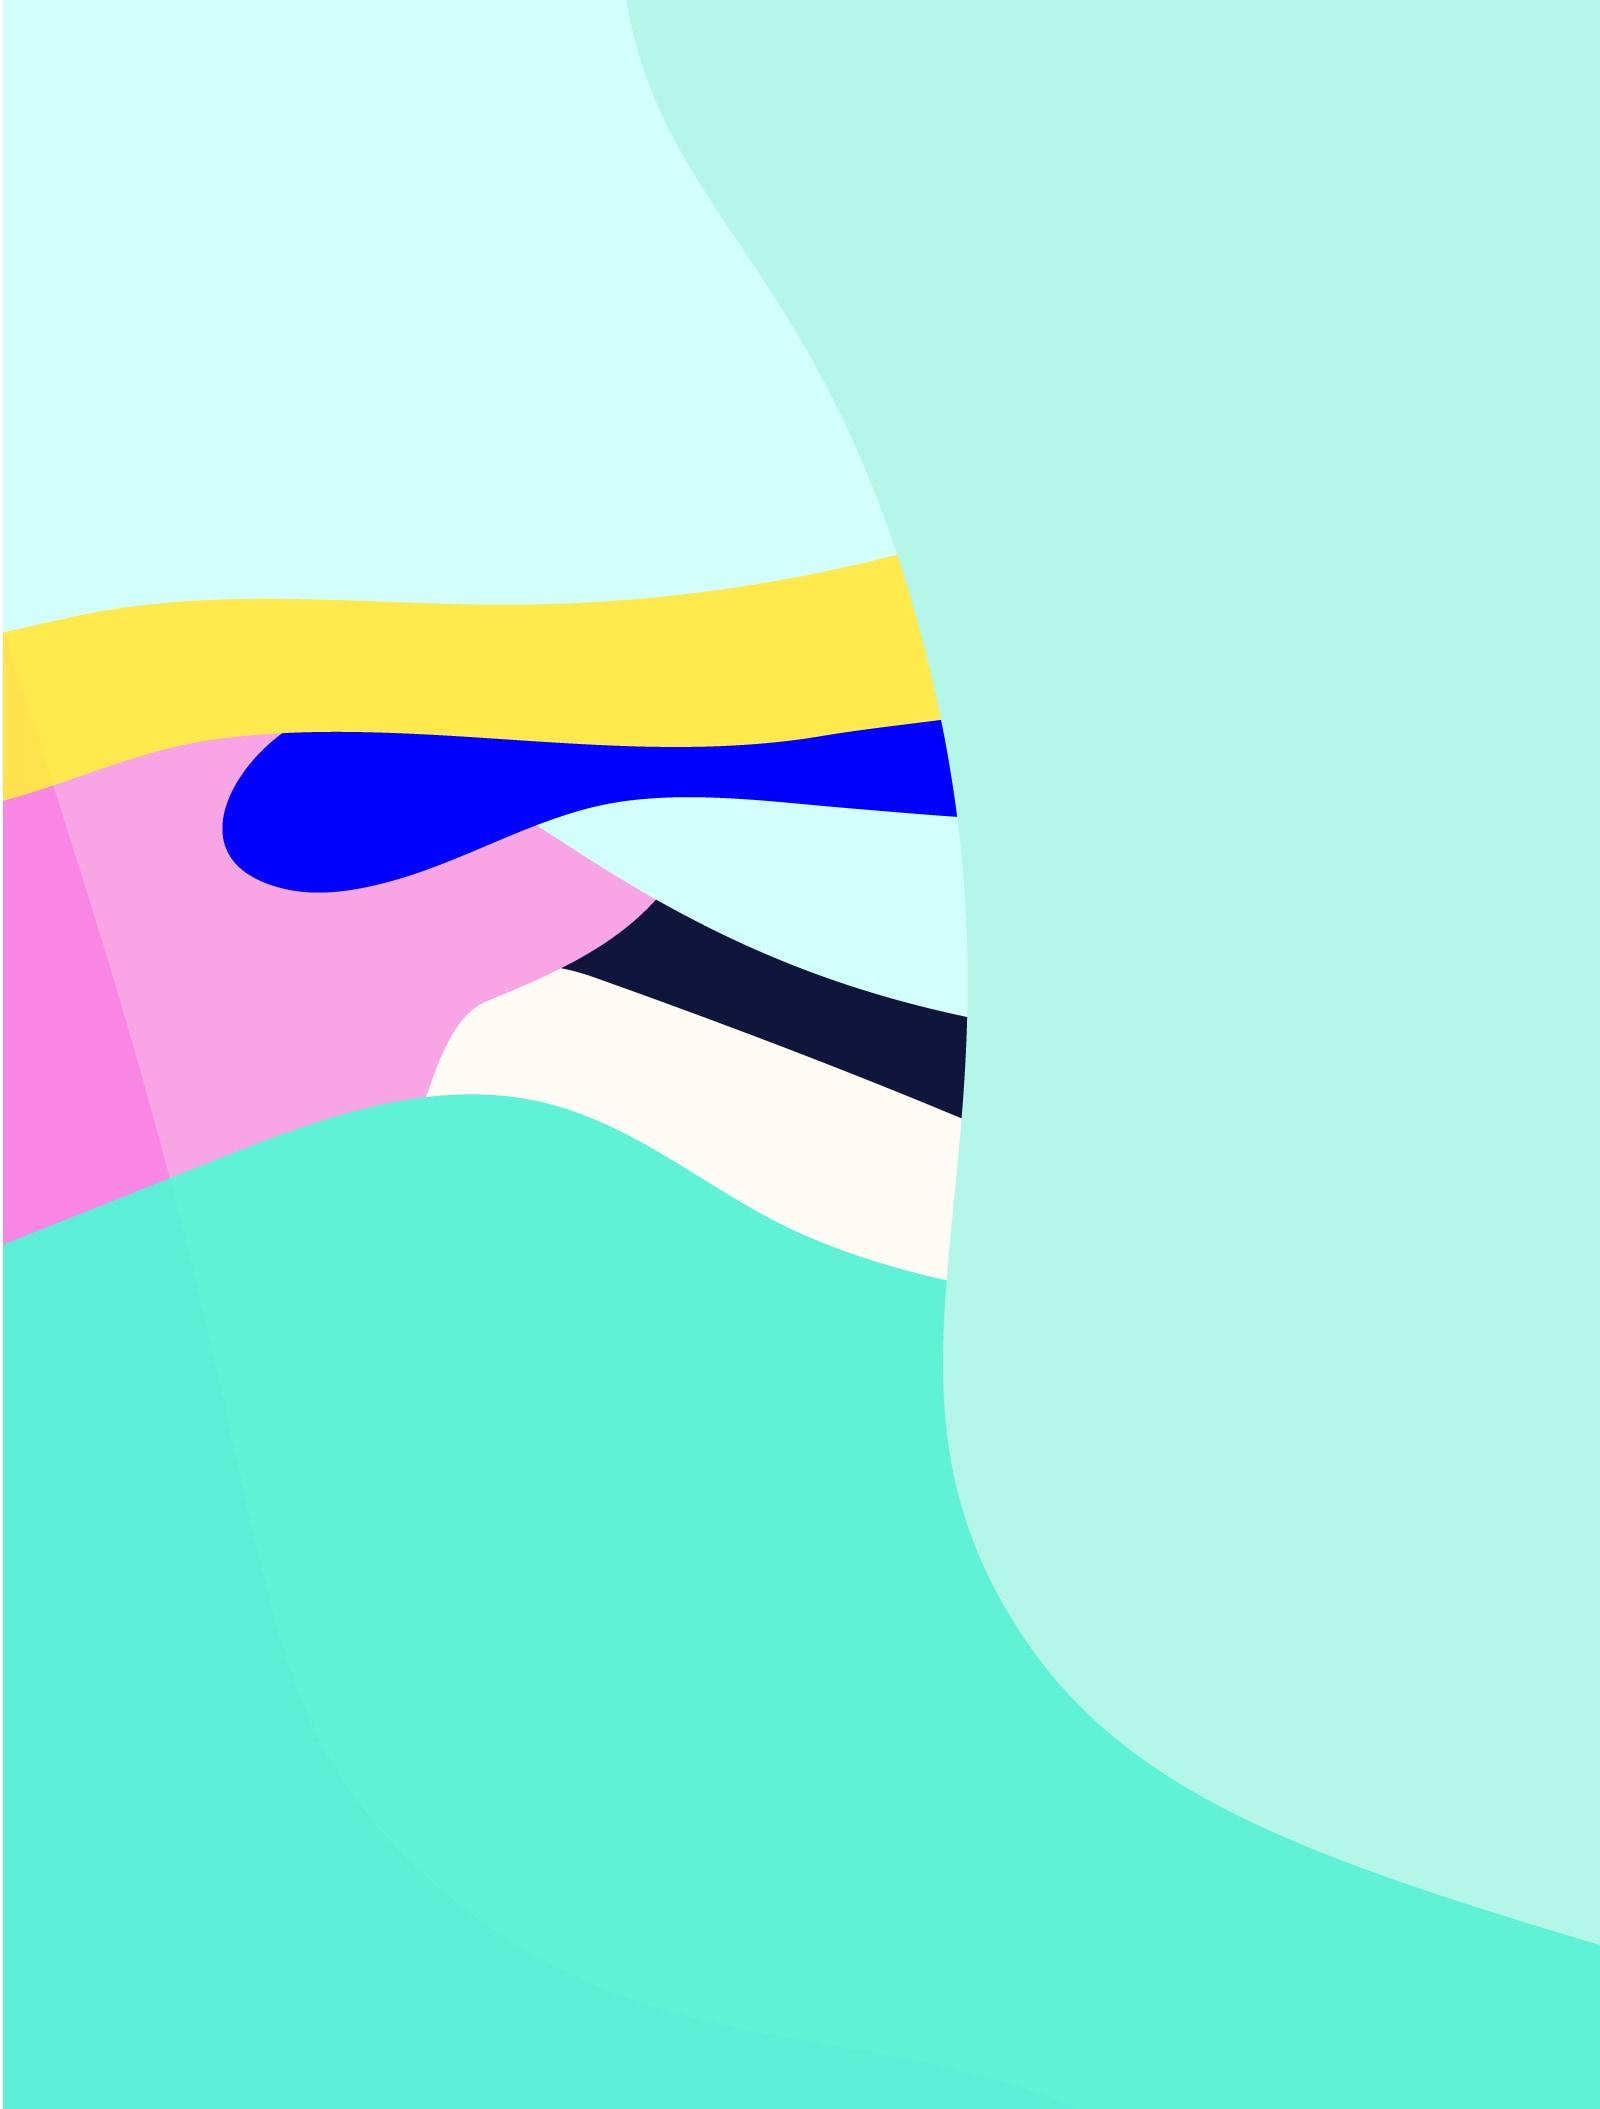 malvina-alves-design-graphique-illustration-directrice-artistique-photographe